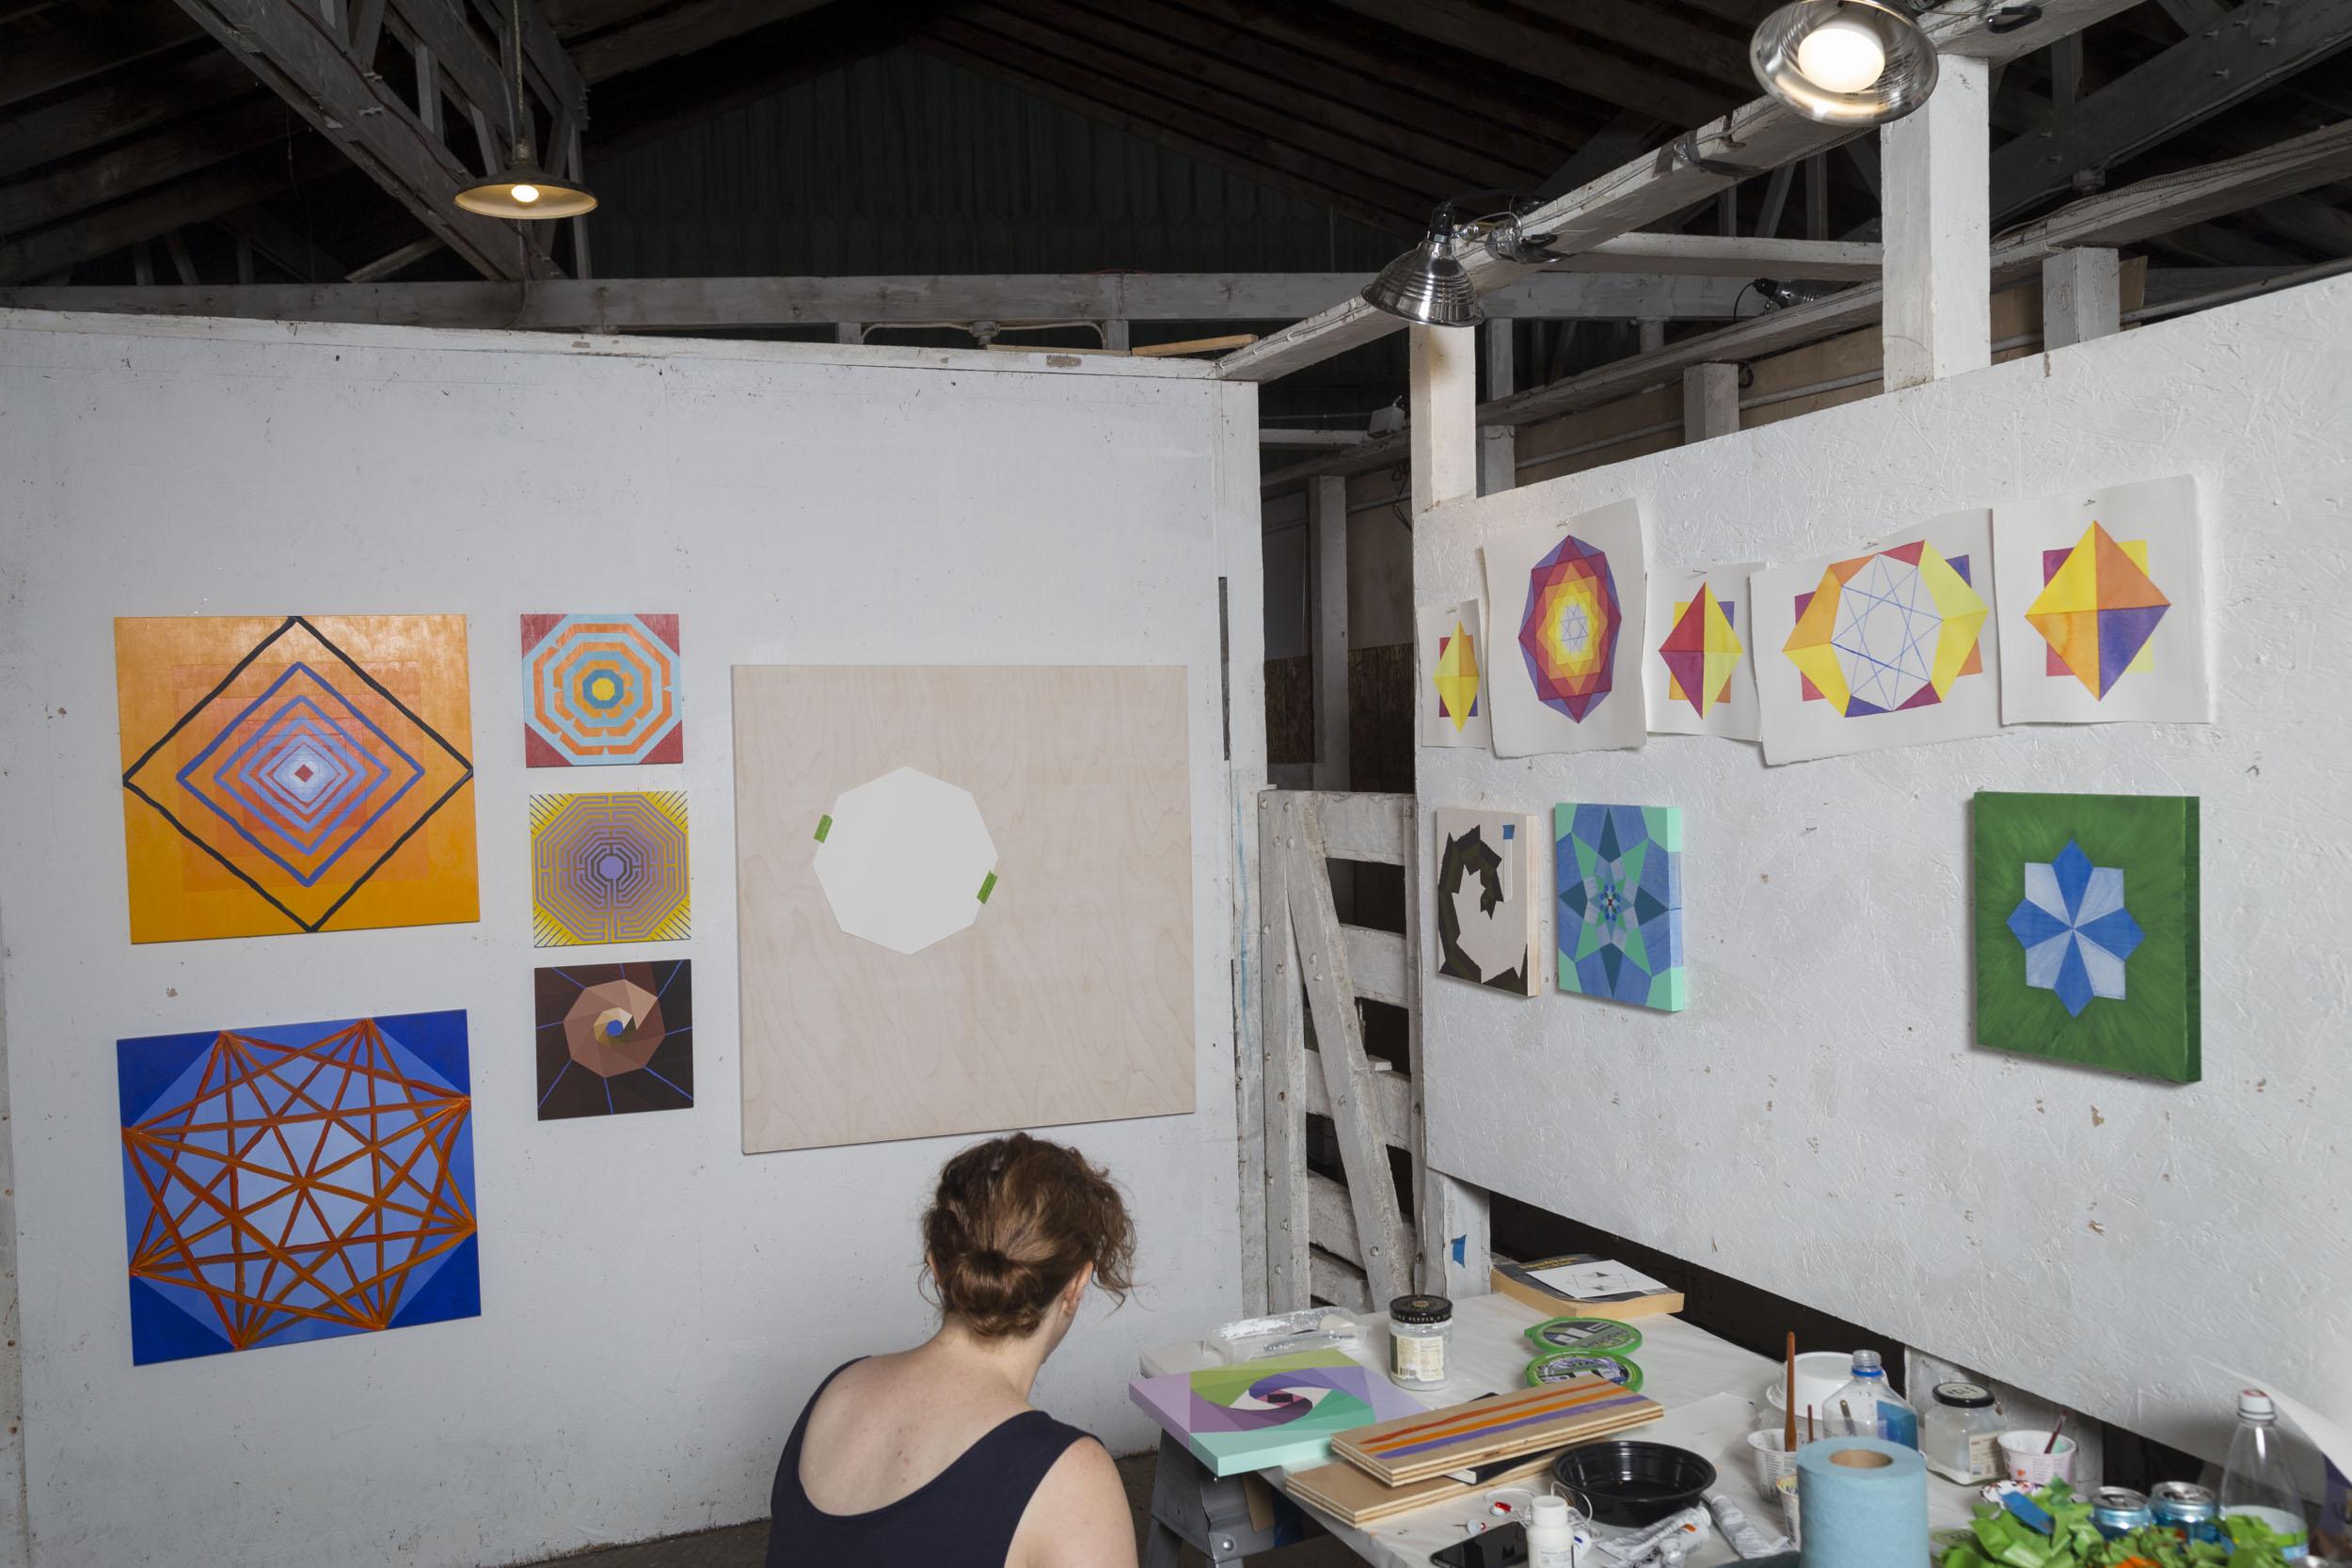 wassaic-project-artist-amber-heaton-2018-07-25-16-45-32.jpg